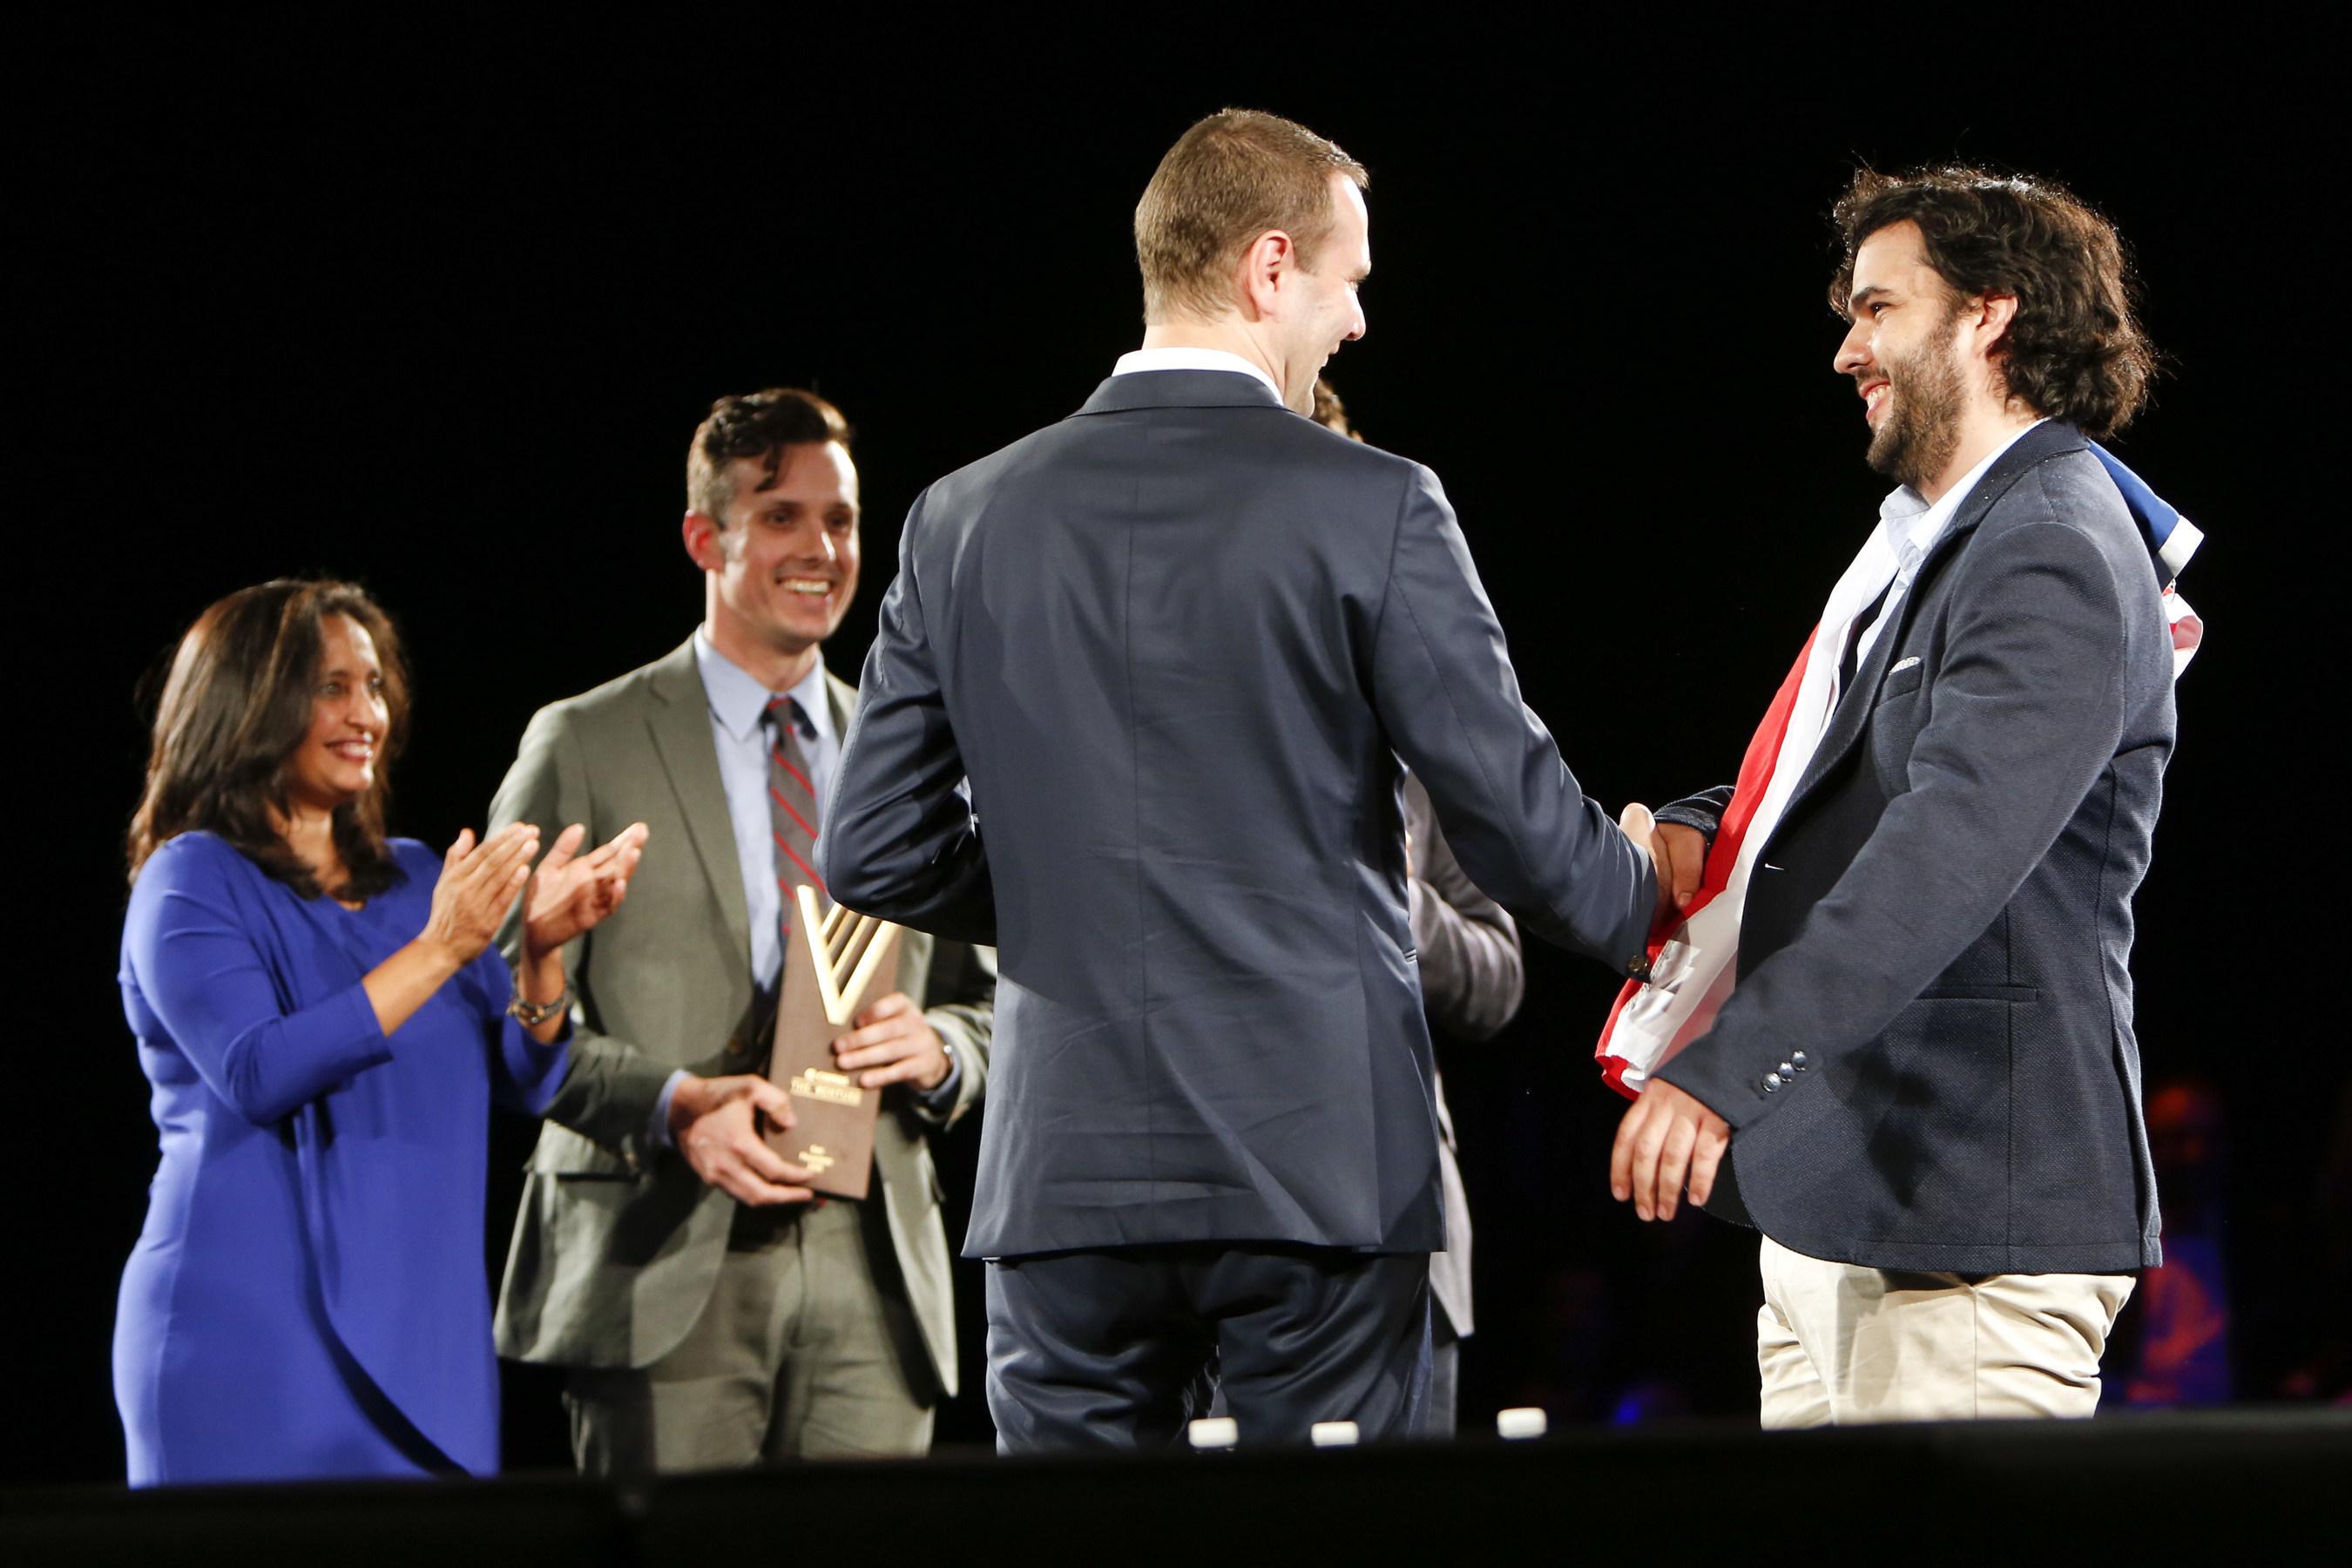 Congratuations for The Venture finalists